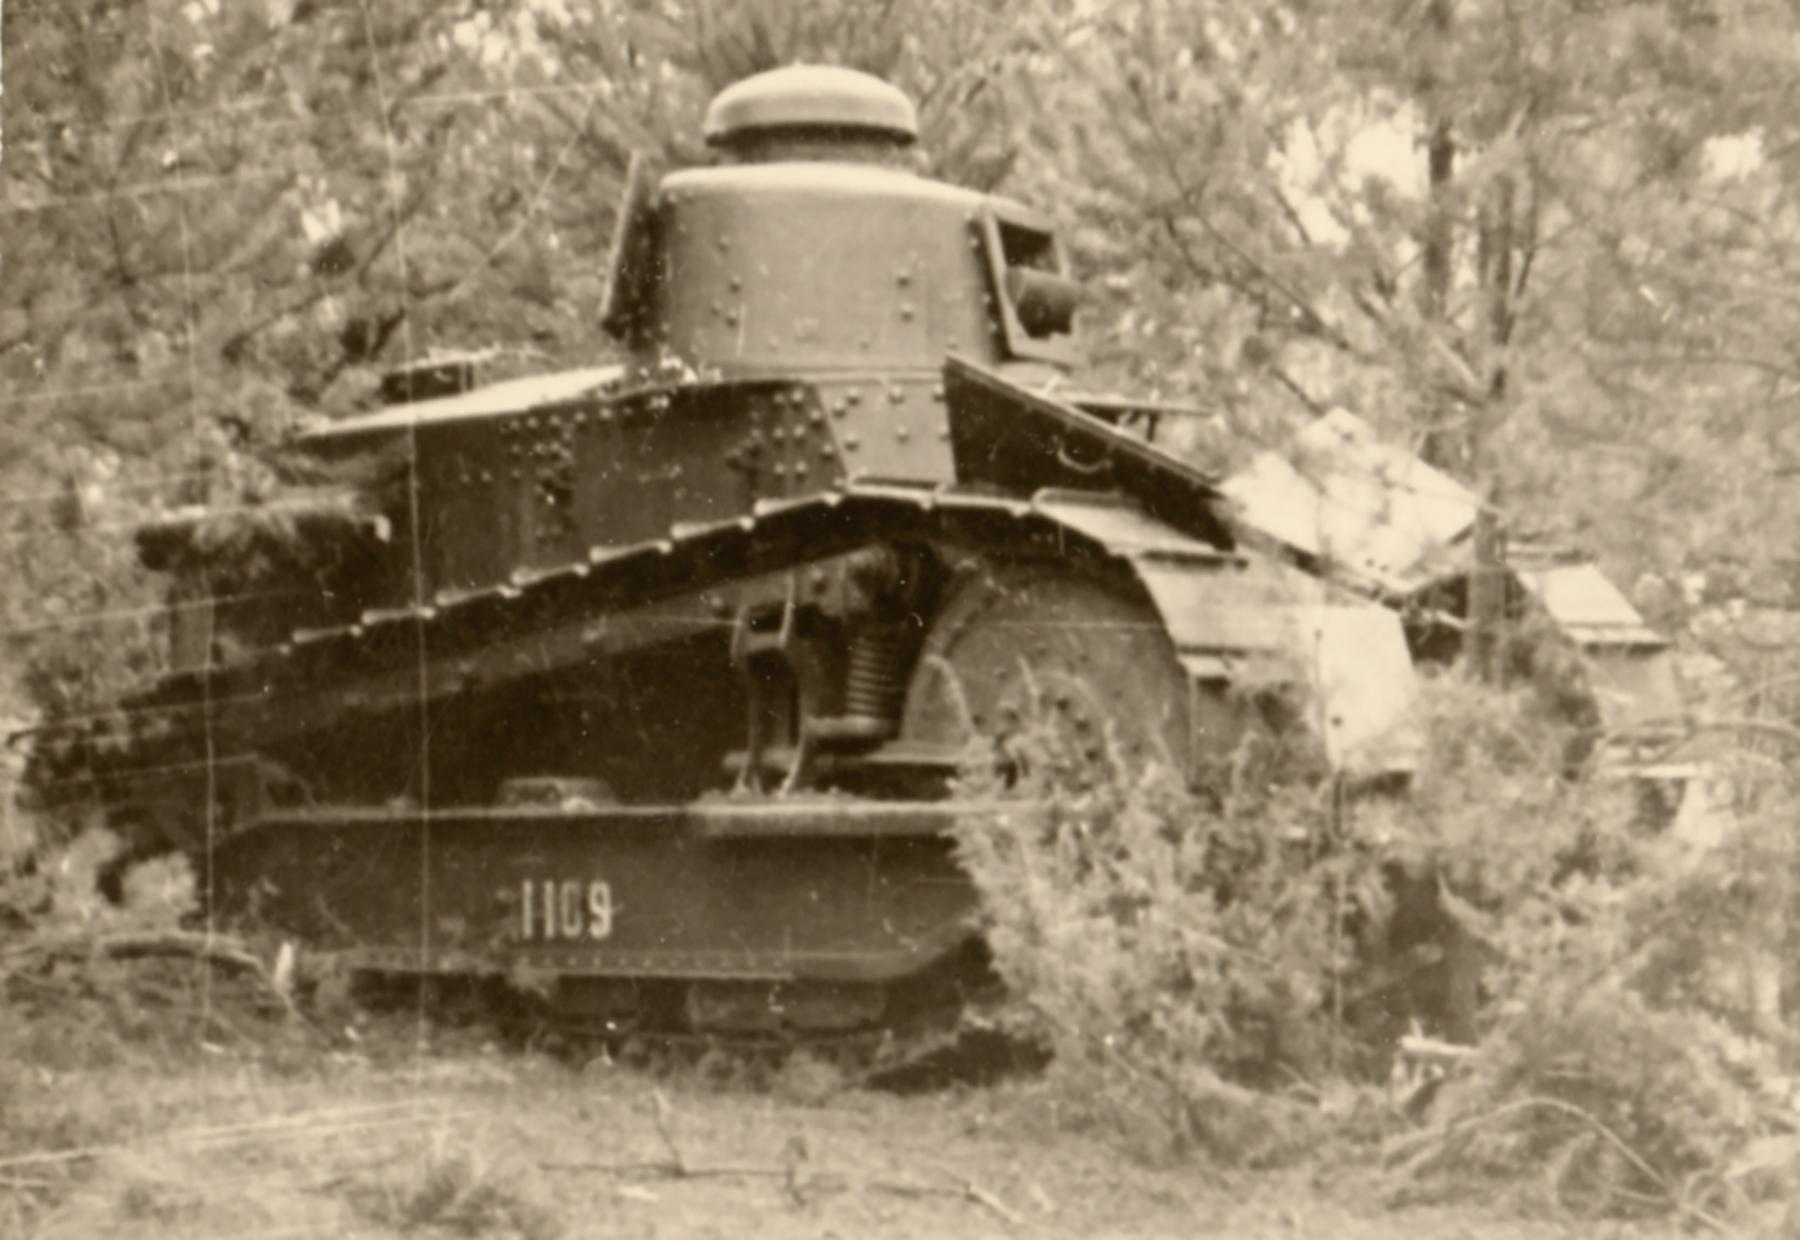 French built Renault FT 18 sn1109 captured in Poland 1939 ebay 01